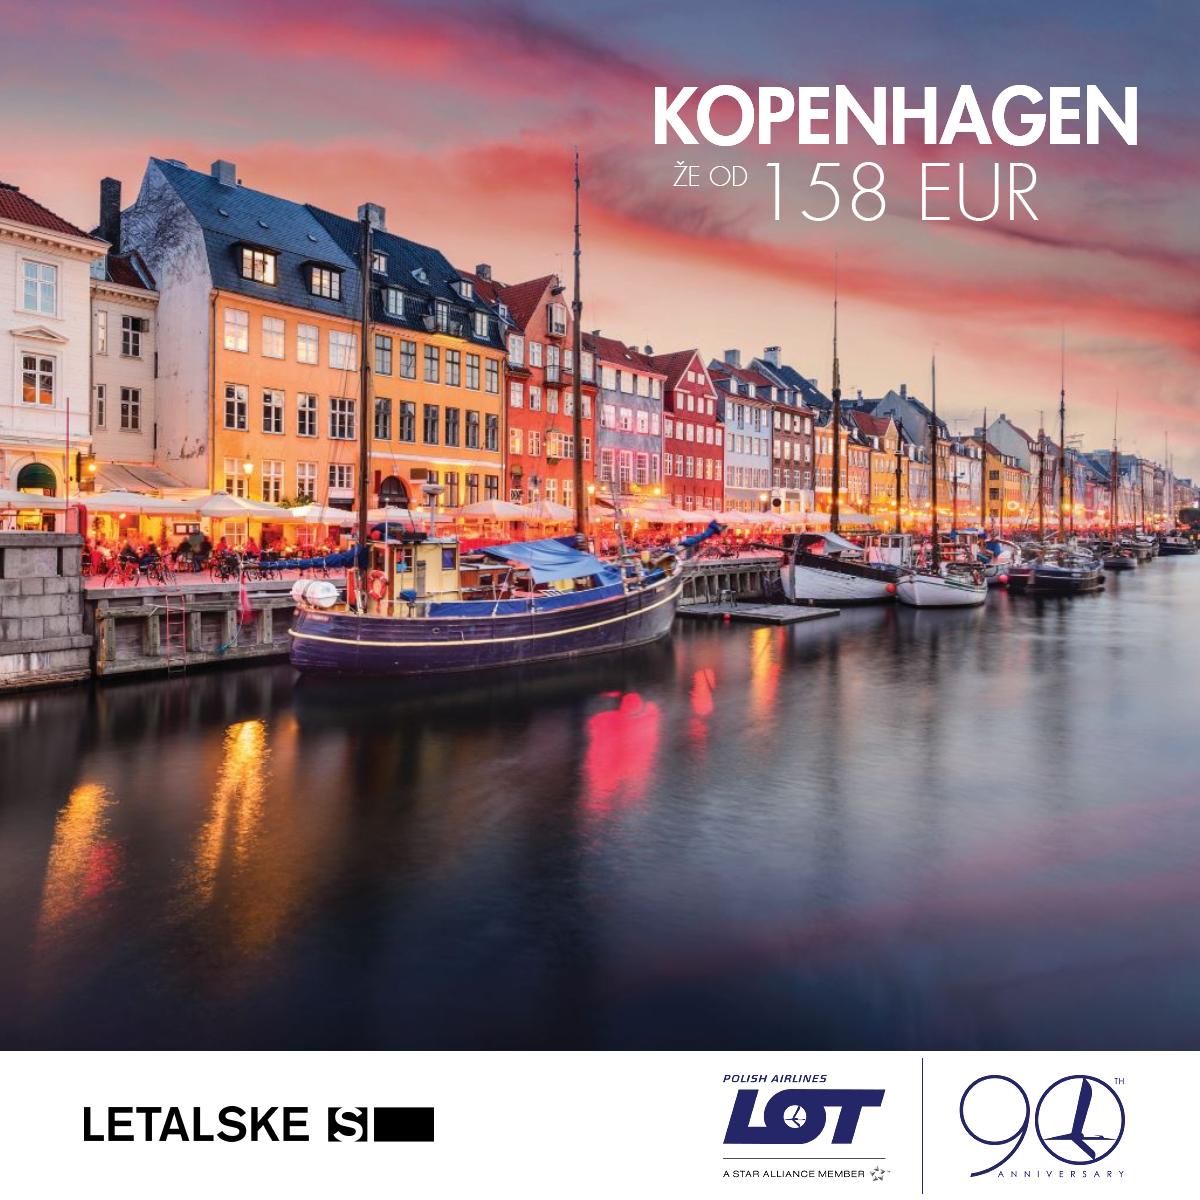 Kopenhagen vizual, Kopenhagen već od 1400 kuna, Kopenhagen jeftine avio karte, putovanje za Kopenhagen